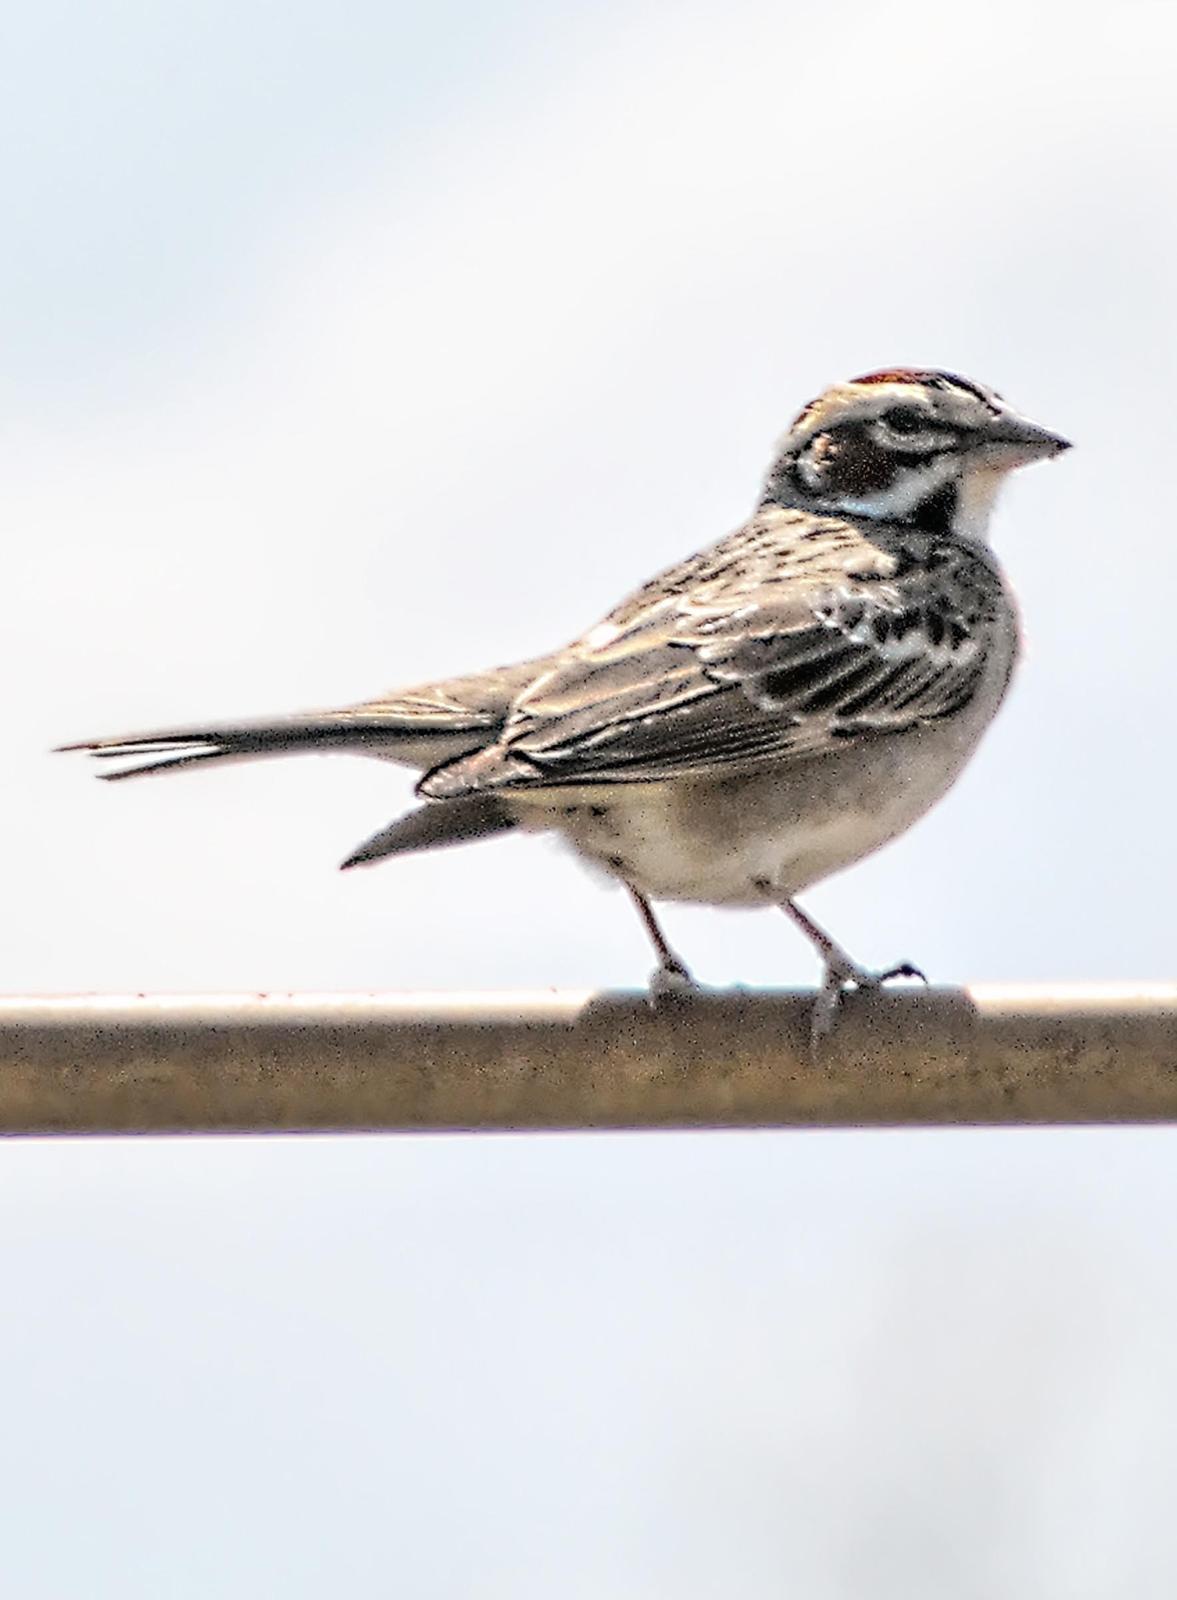 Lark Sparrow Photo by Dan Tallman